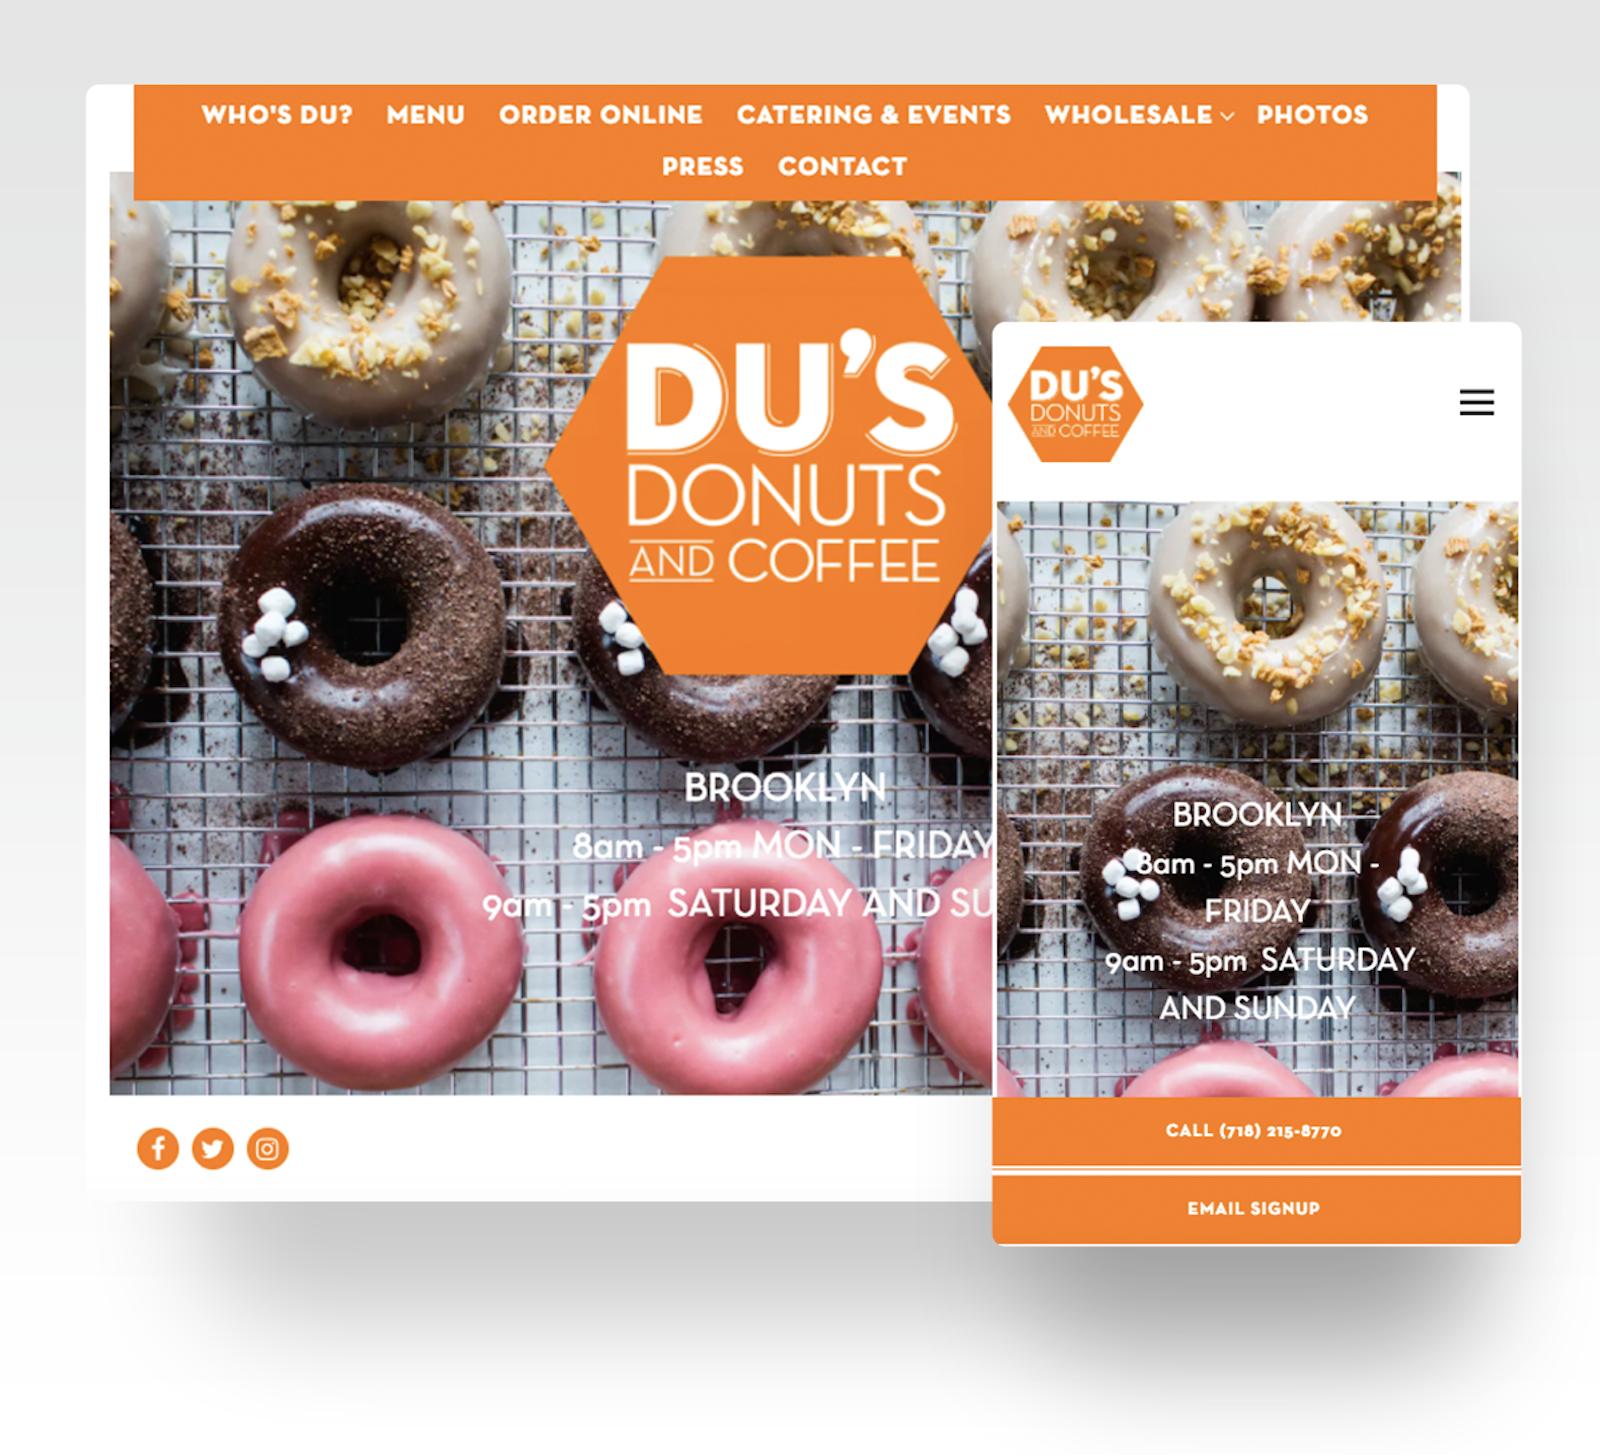 Du's Donuts